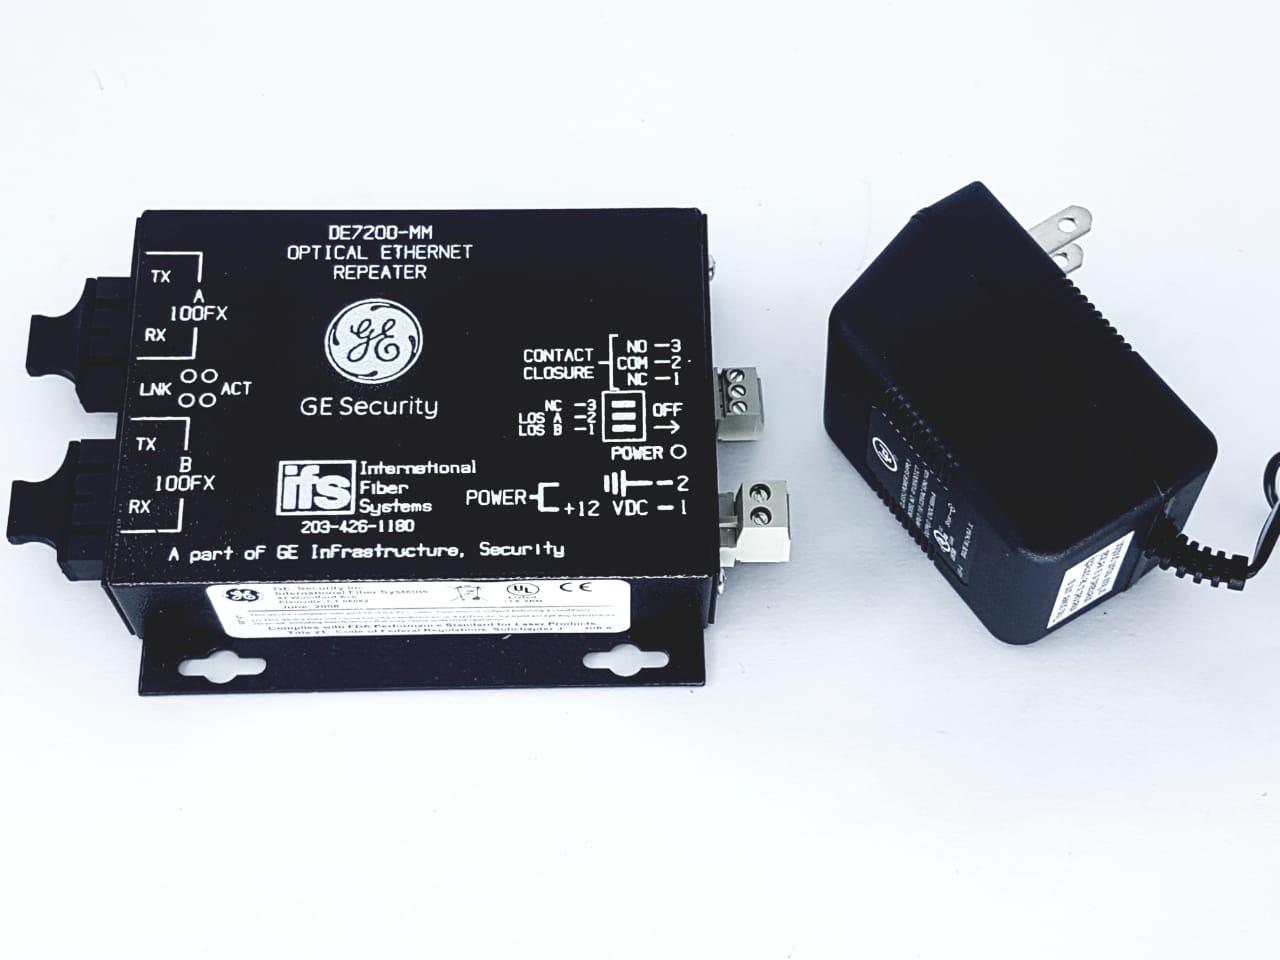 GE Security DE7200-MM Optical Ethernet Novo